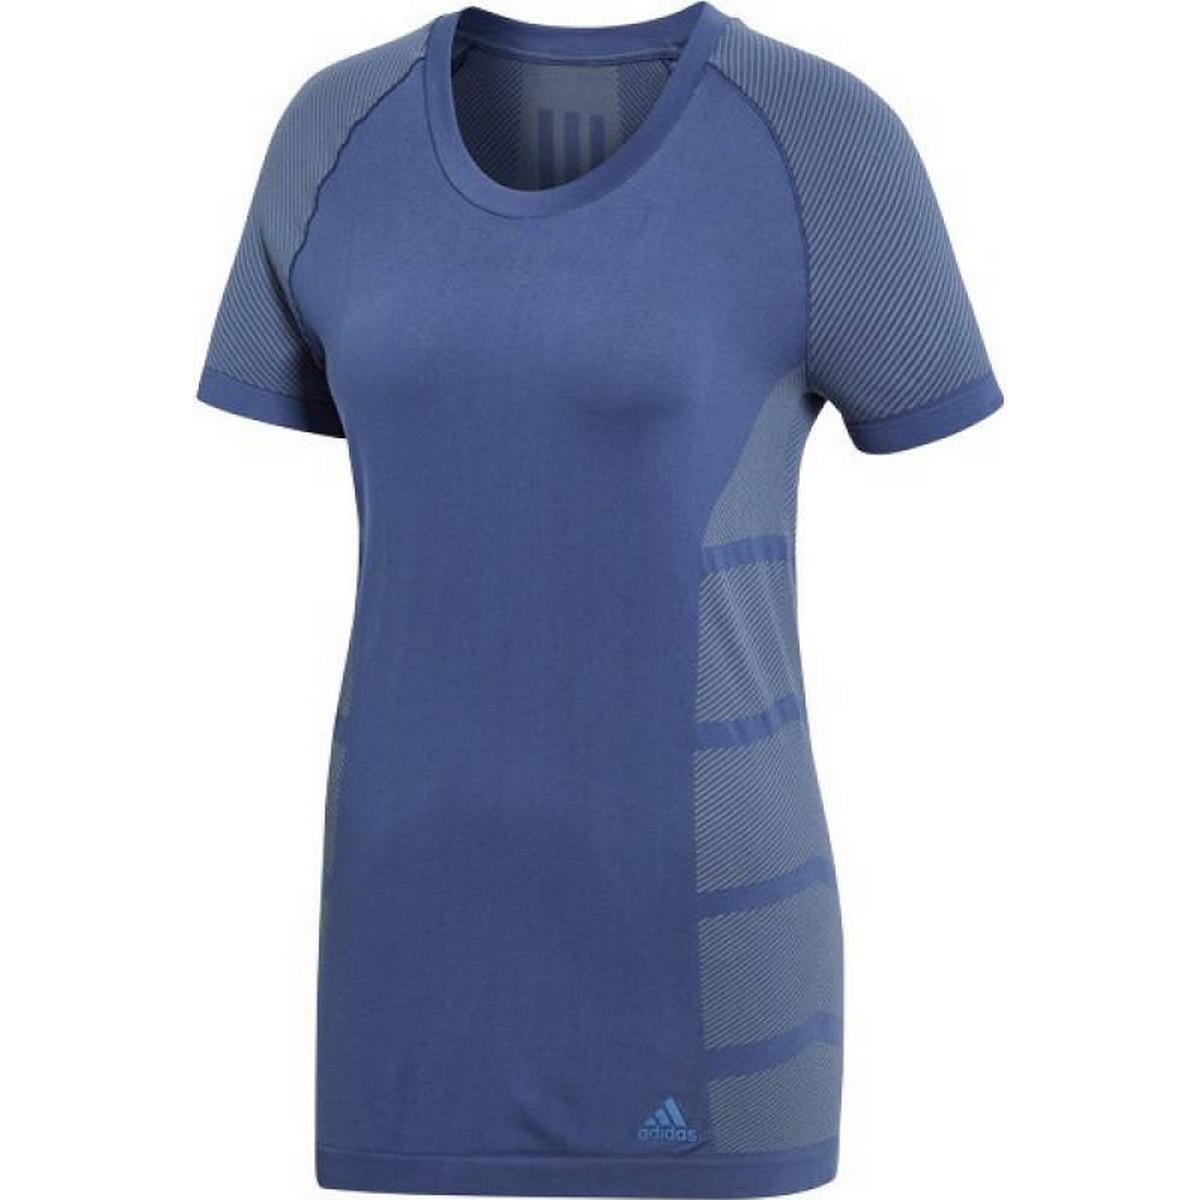 45b2fb76 Adidas Polyamid Sportstøj - Sammenlign priser hos PriceRunner